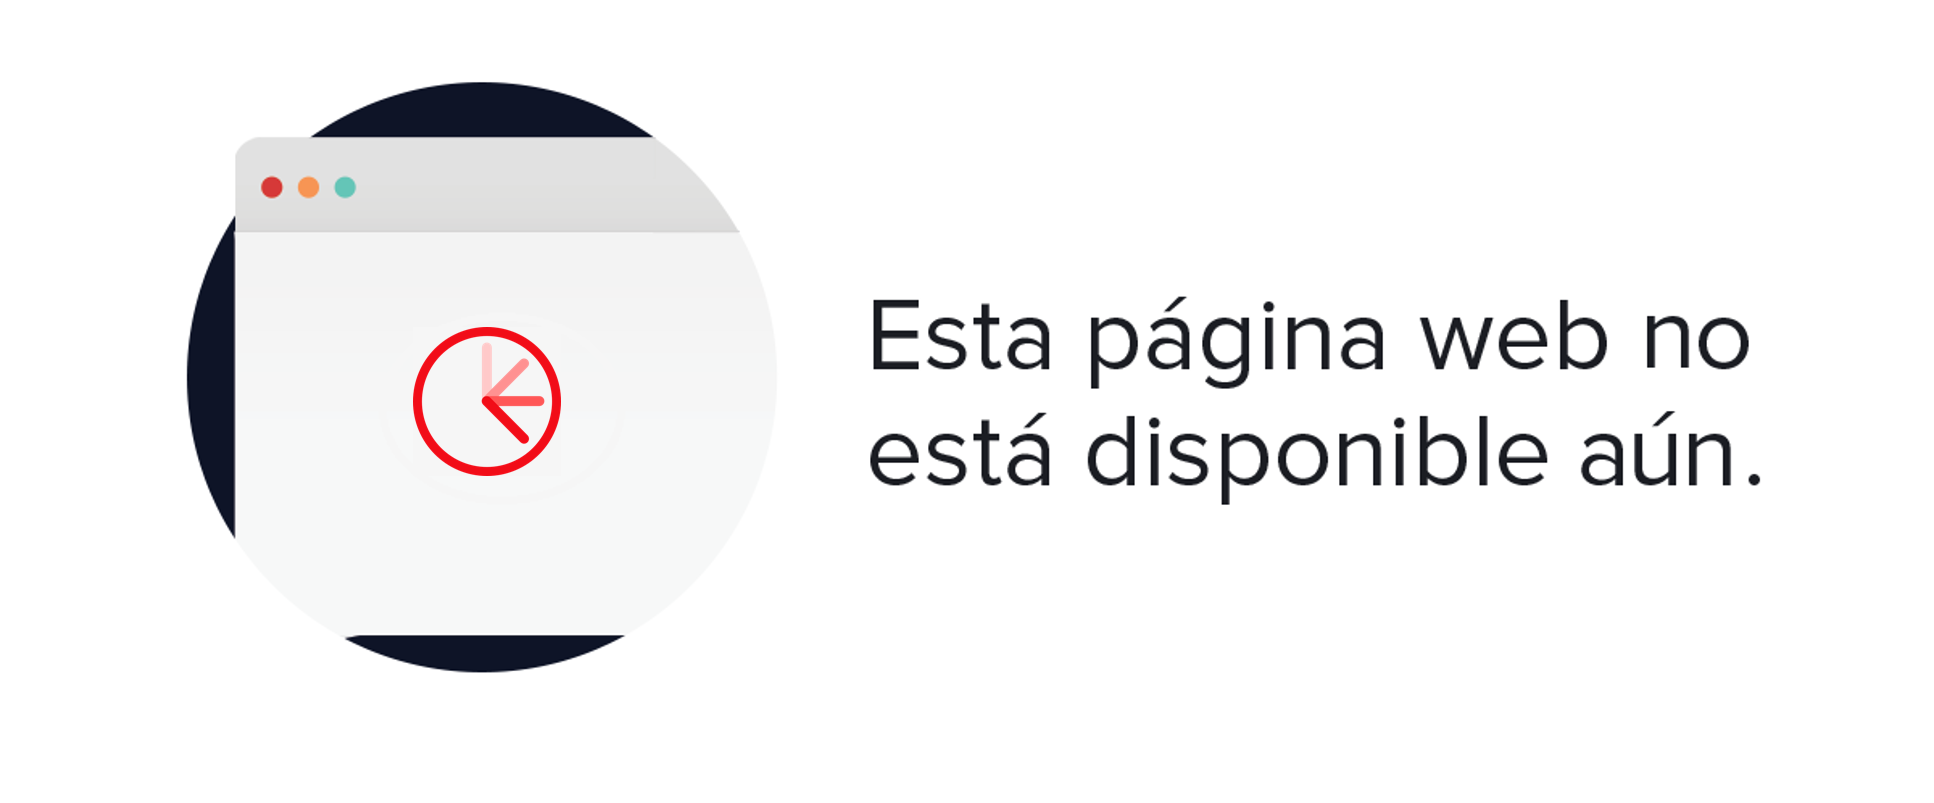 GAP - Pantalón jogger de mujer Gap con logo Azul marino 001085680200277001 - KFKPVNO